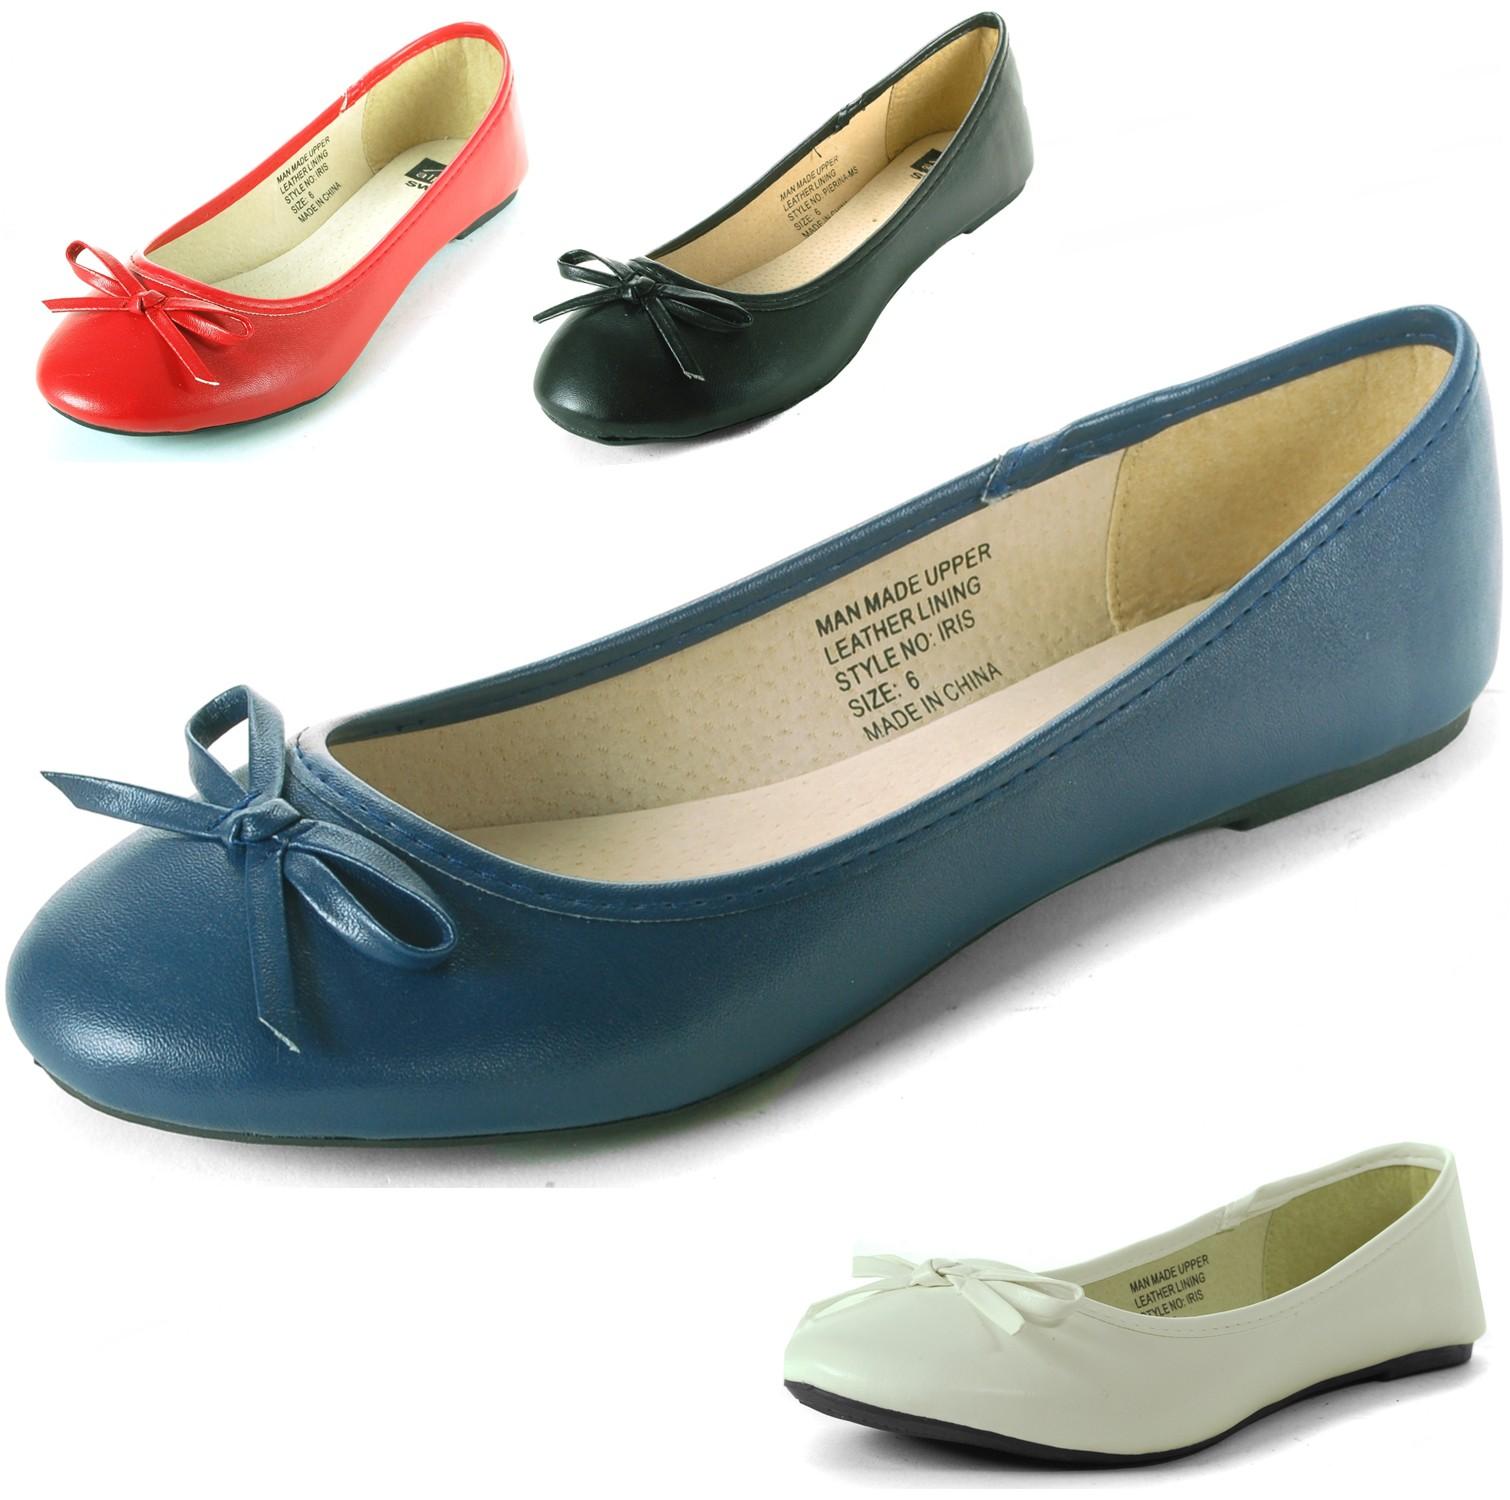 Alpine-Swiss-Iris-Womens-Ballet-Flats-Suede-Lined-Classic-Bow-Ballerina-Slippers thumbnail 15